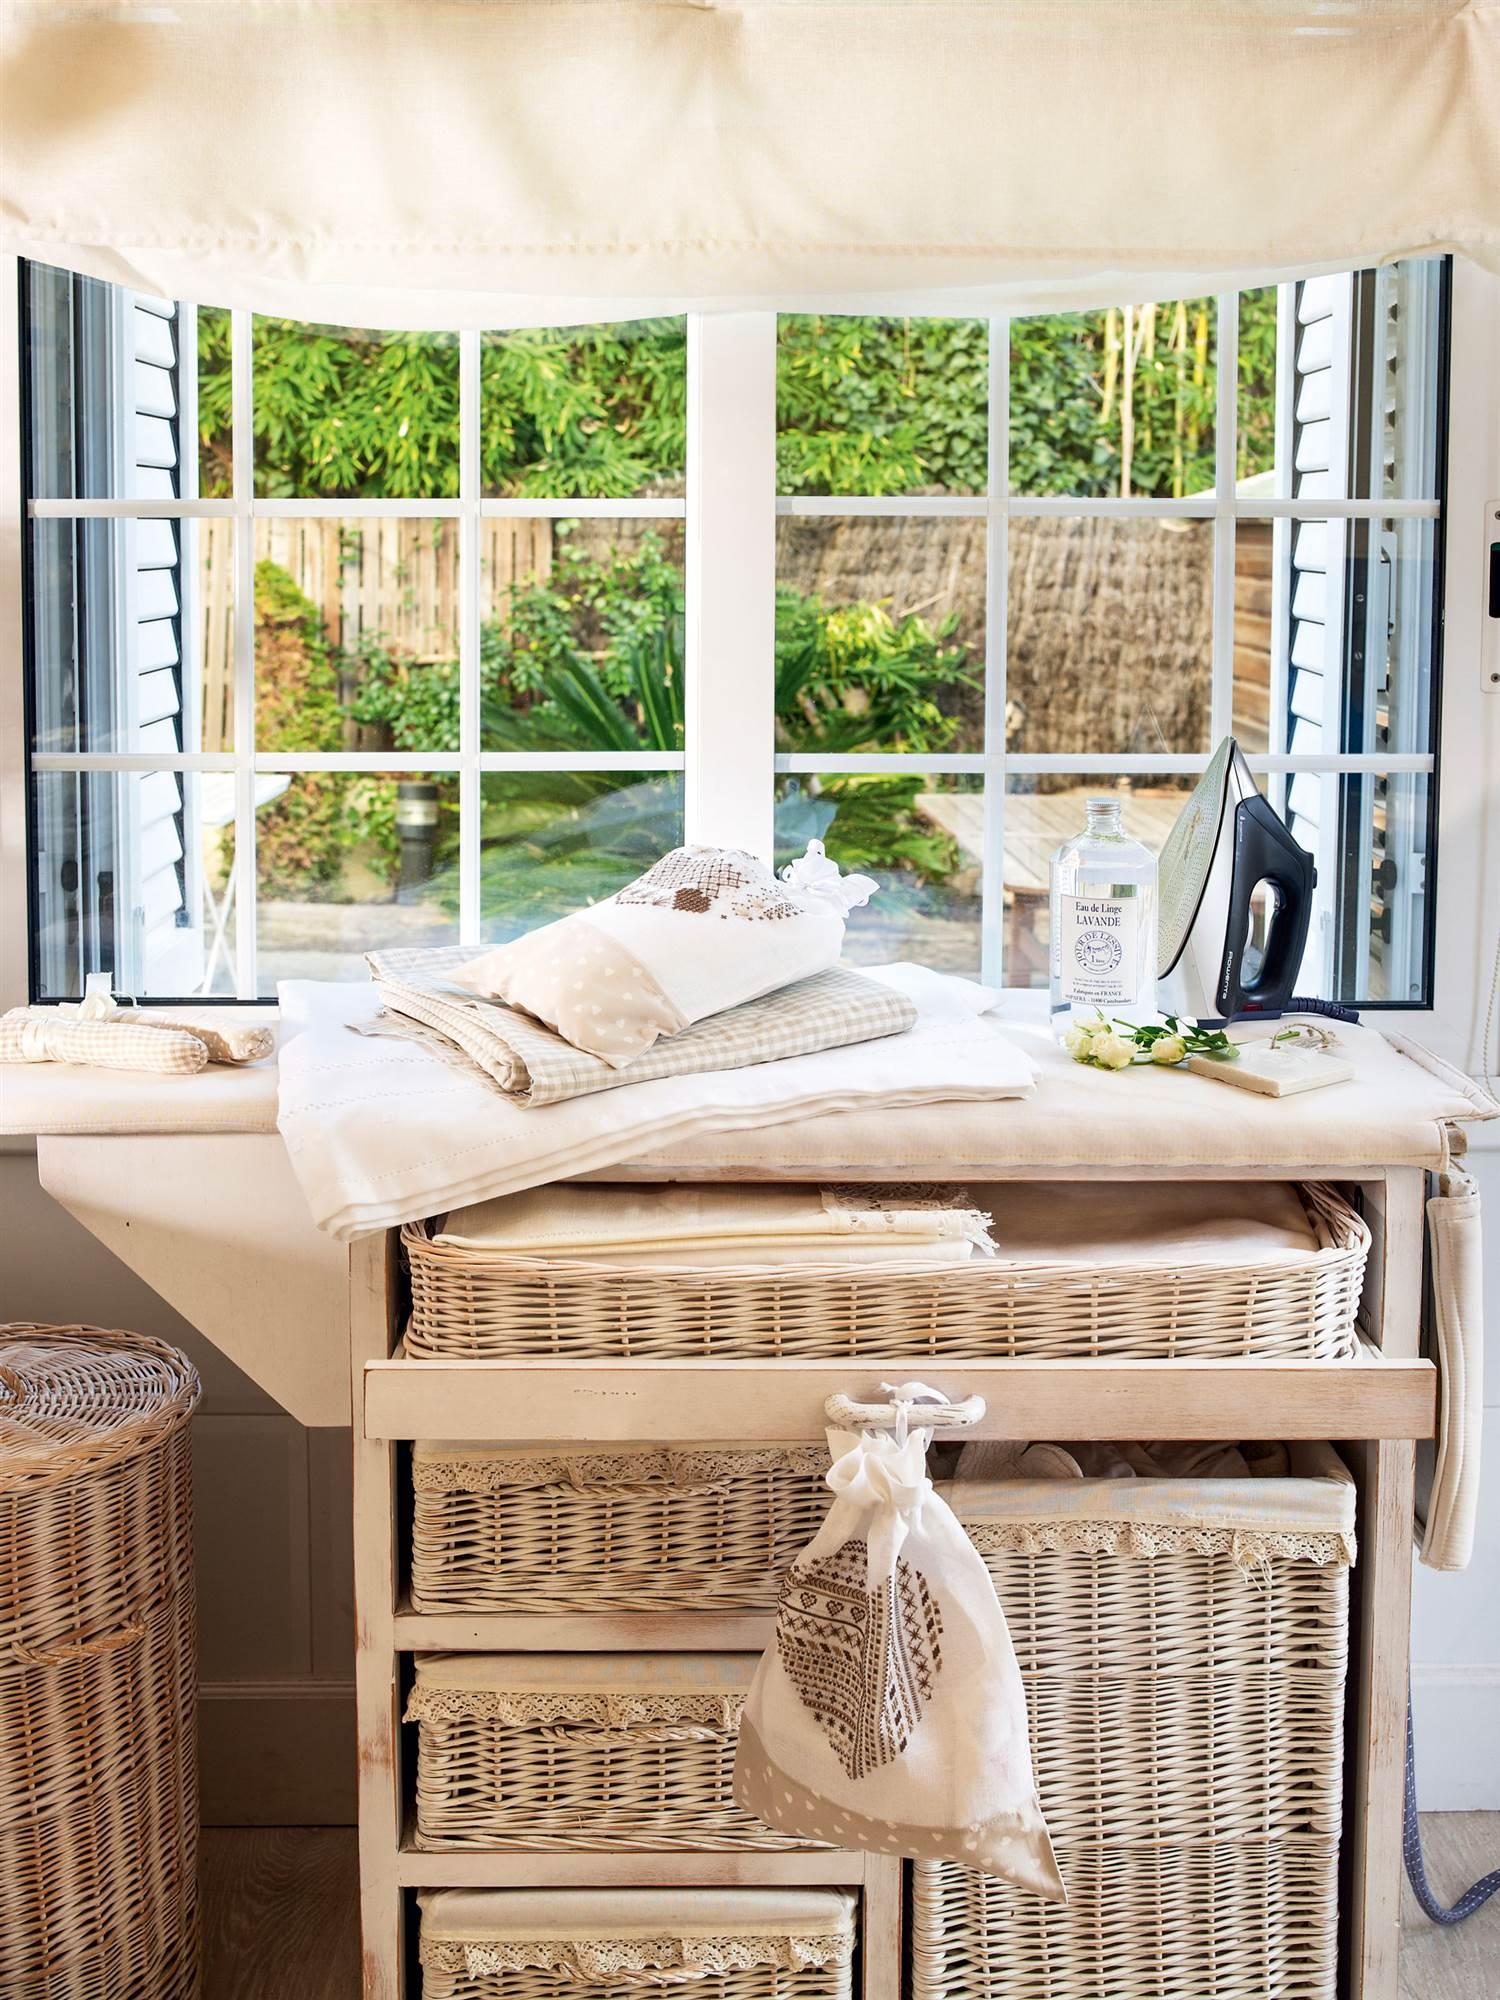 Crea un planchador perfecto for Planchador de ropa